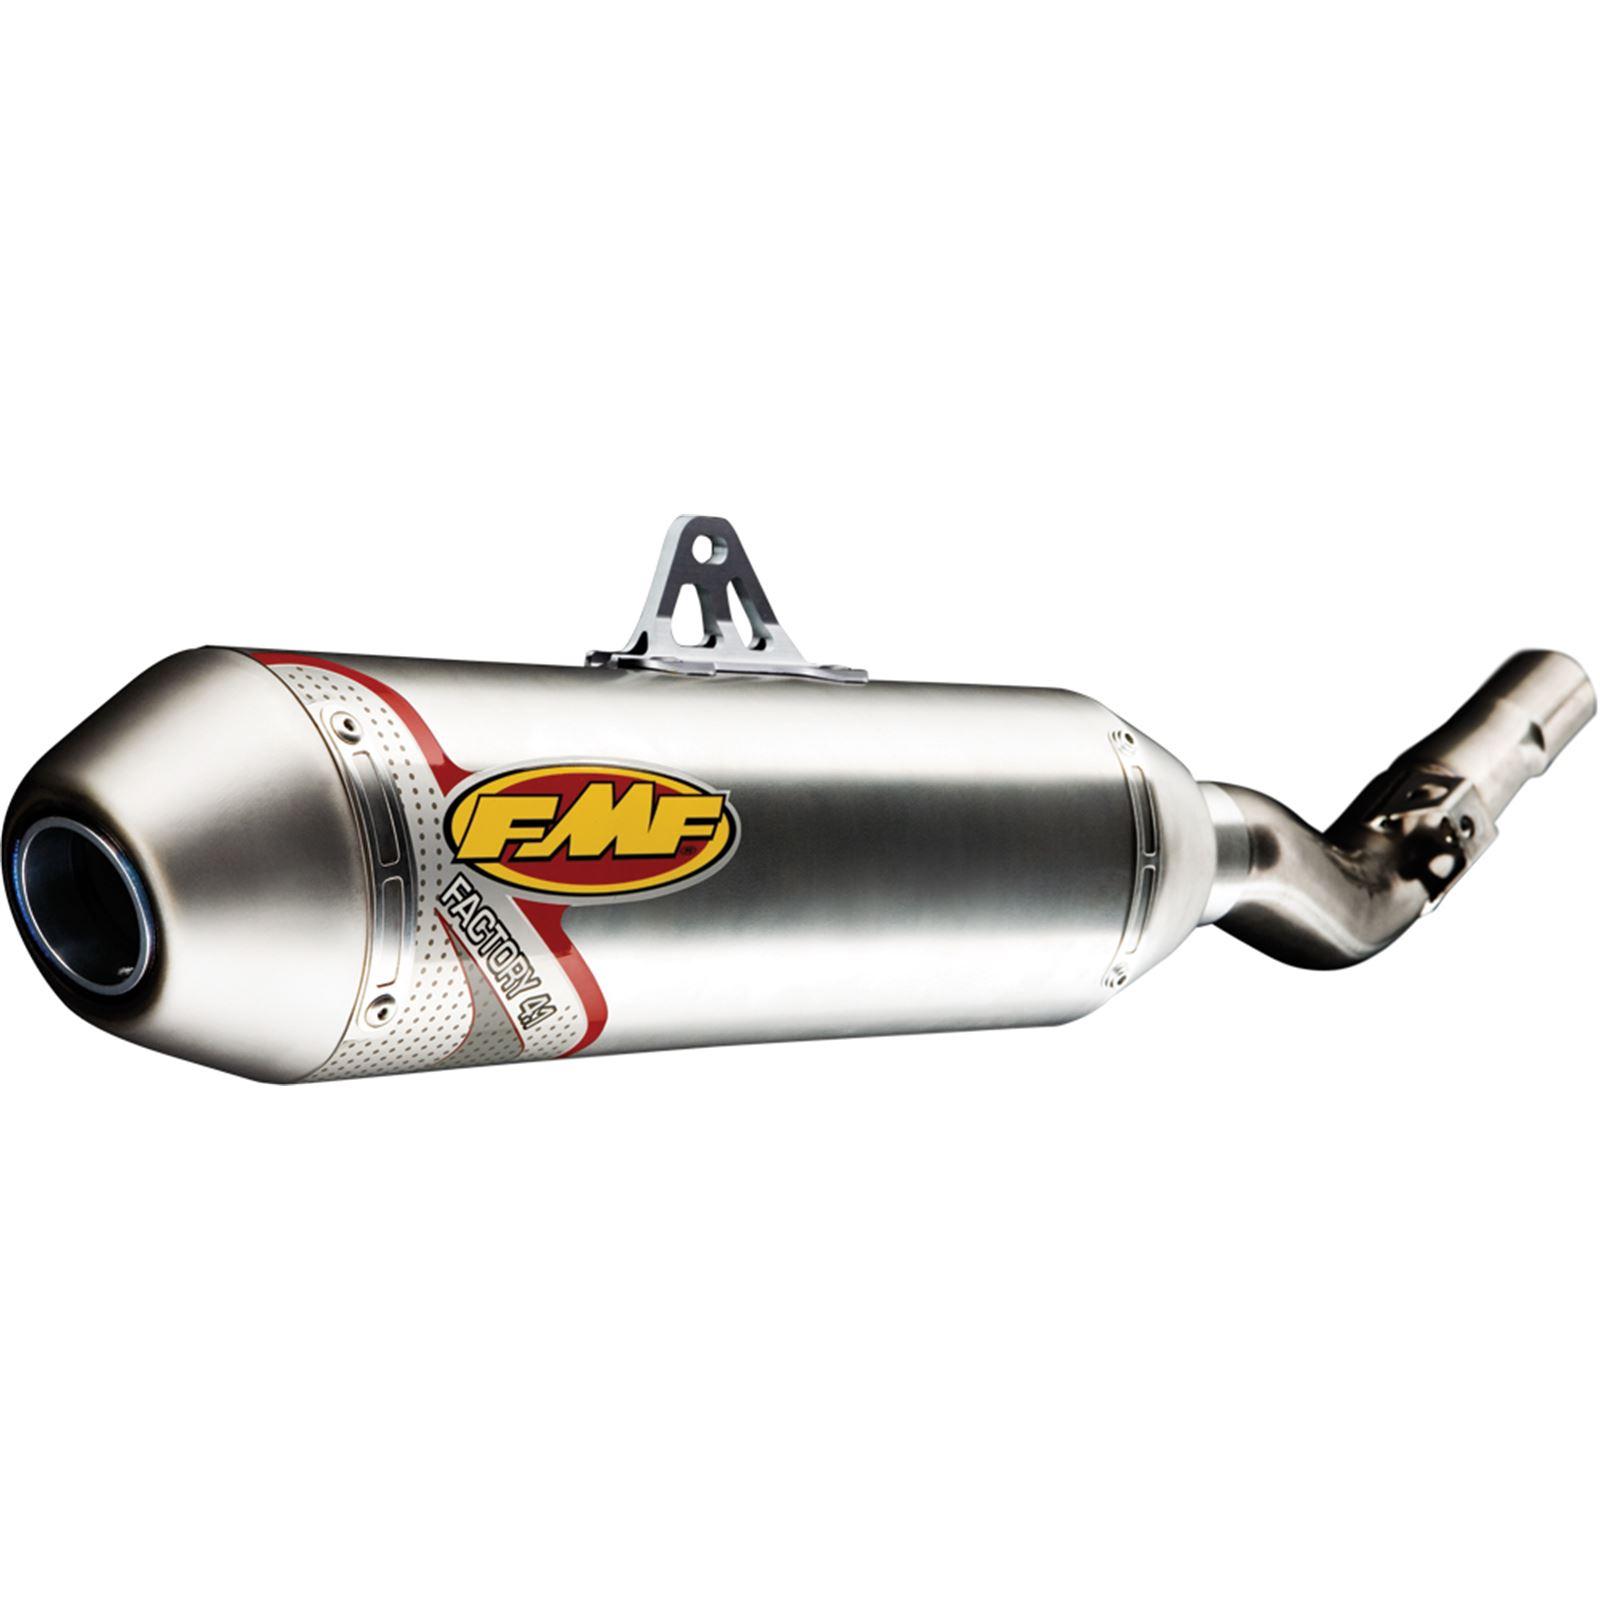 FMF Racing Factory 4.1 SL 4-Stroke Silencer